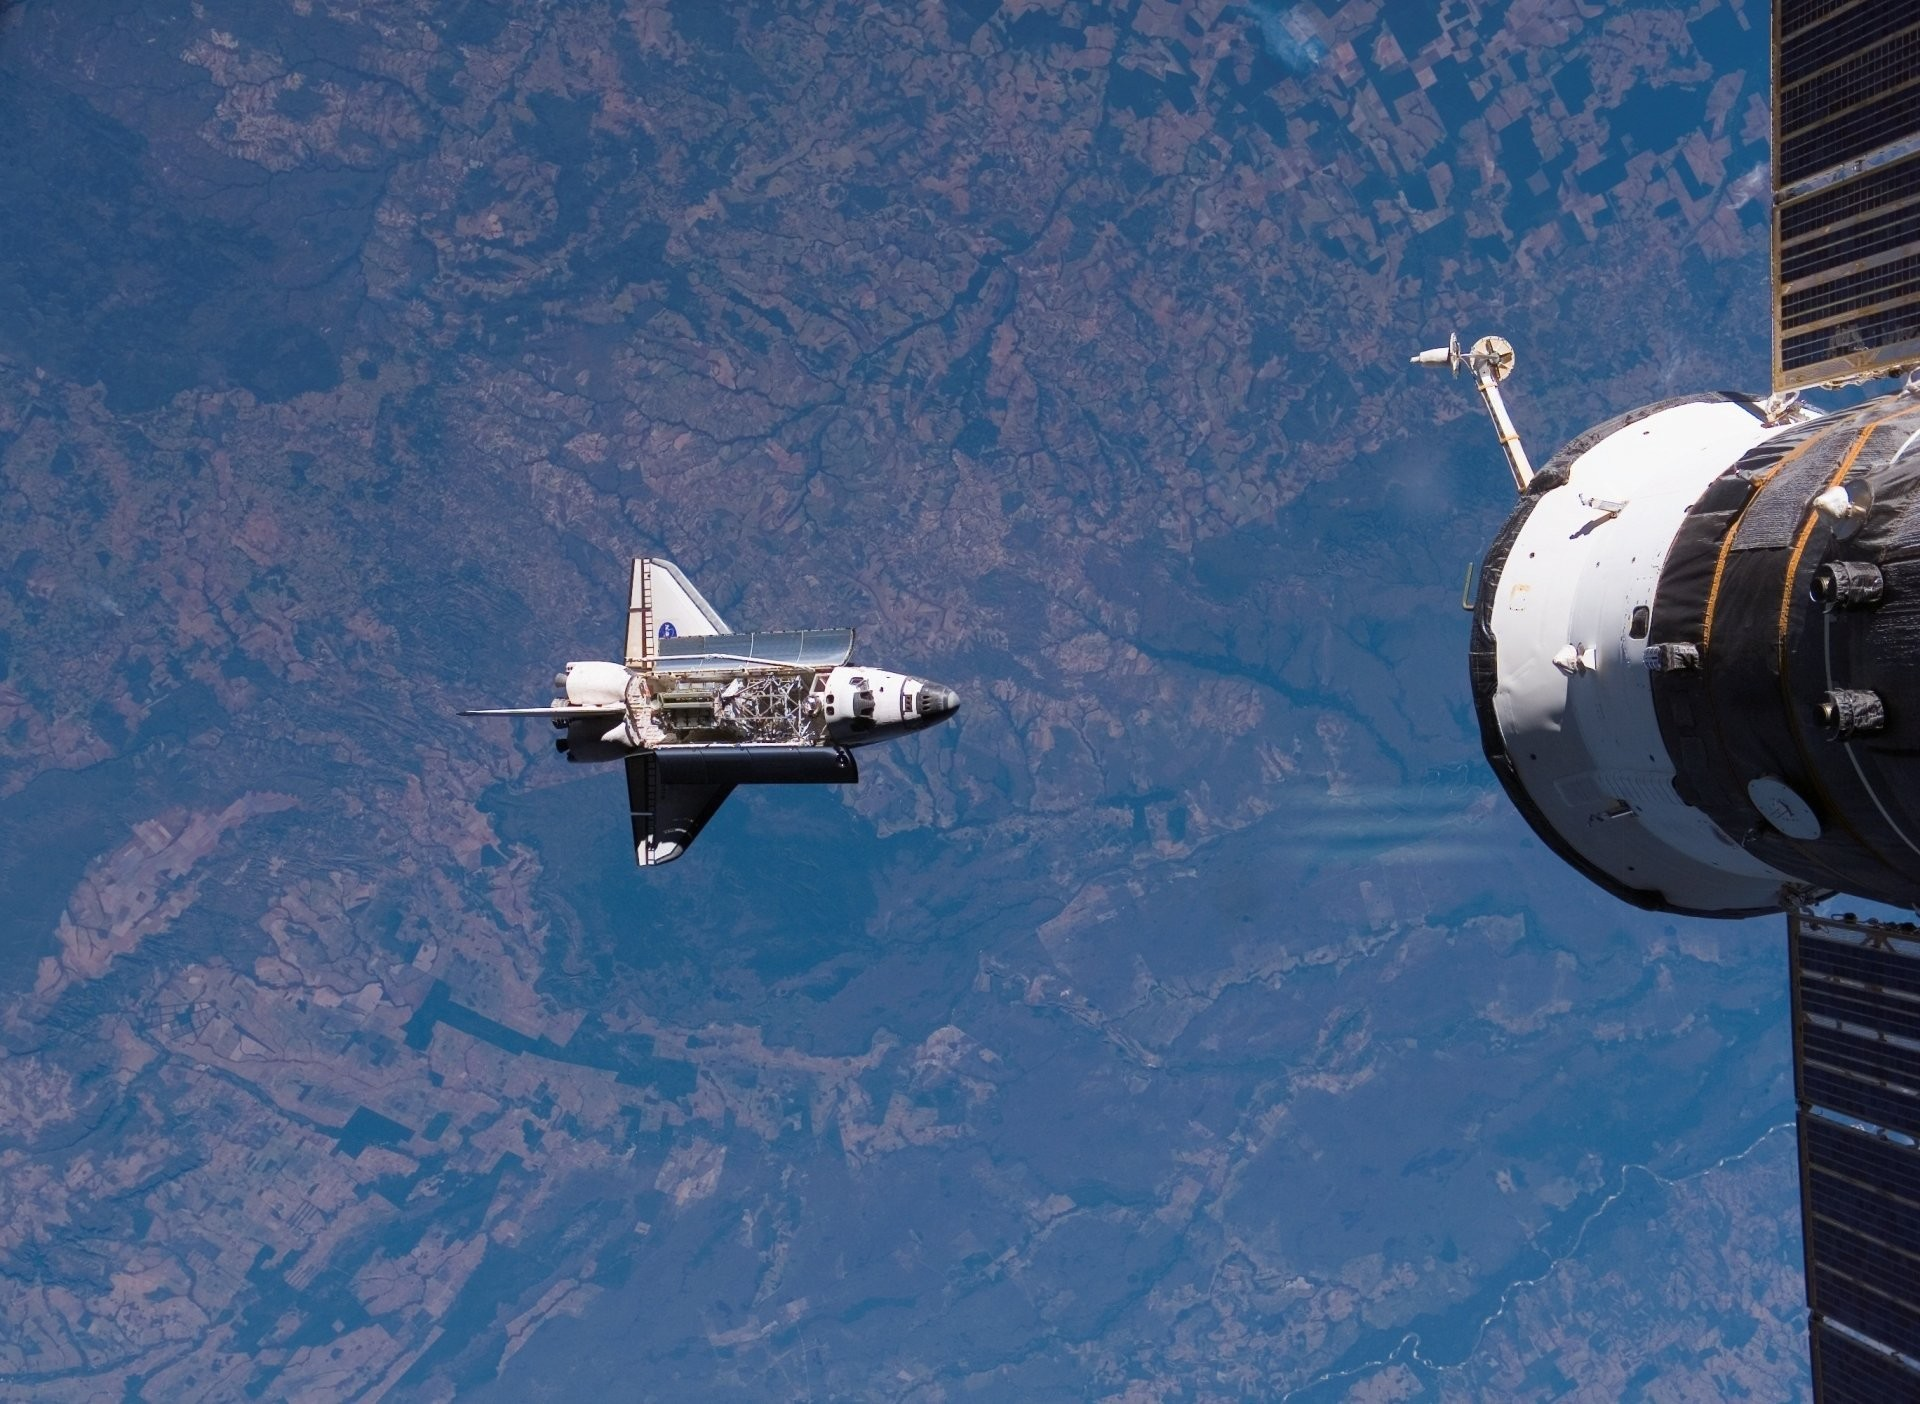 international space station wallpaper – photo #9. Home amp Office ThinkGeek